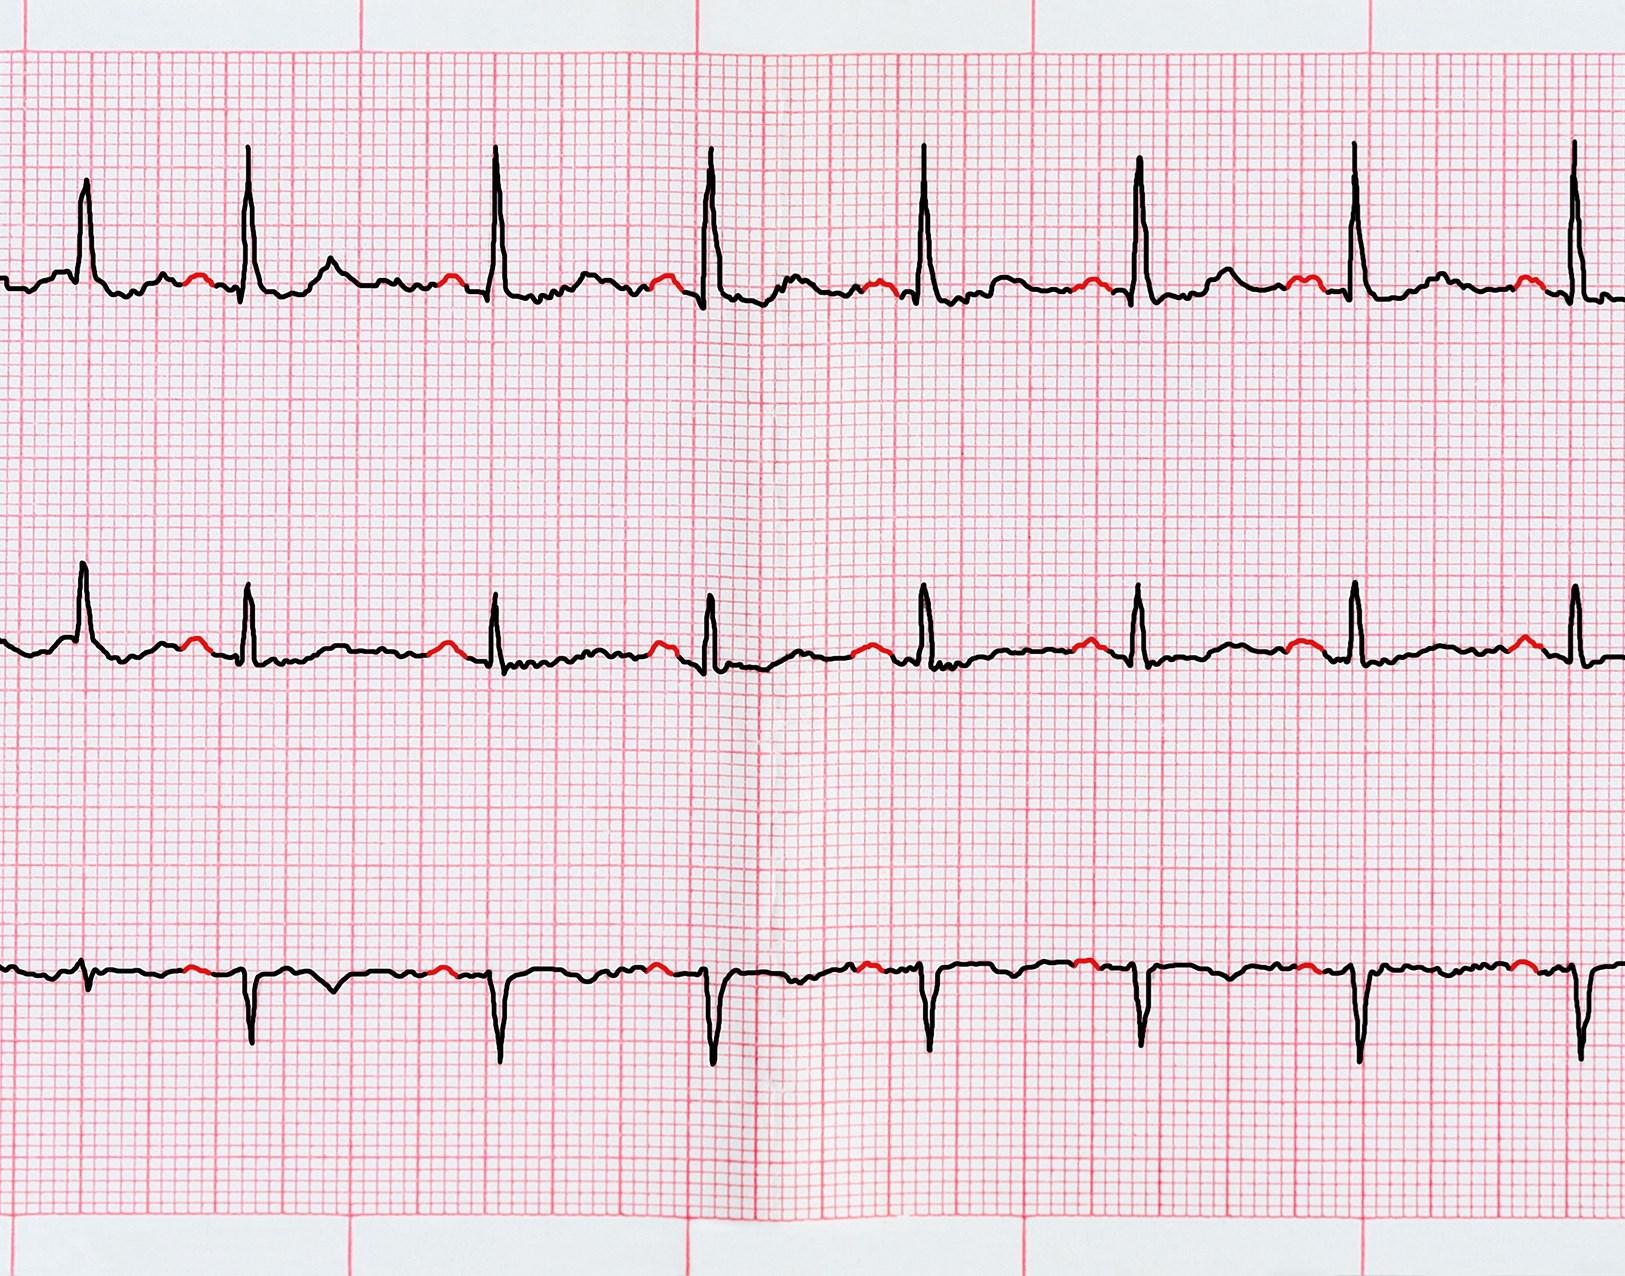 Atrial Fibrillation Mortality May Increase With Digoxin